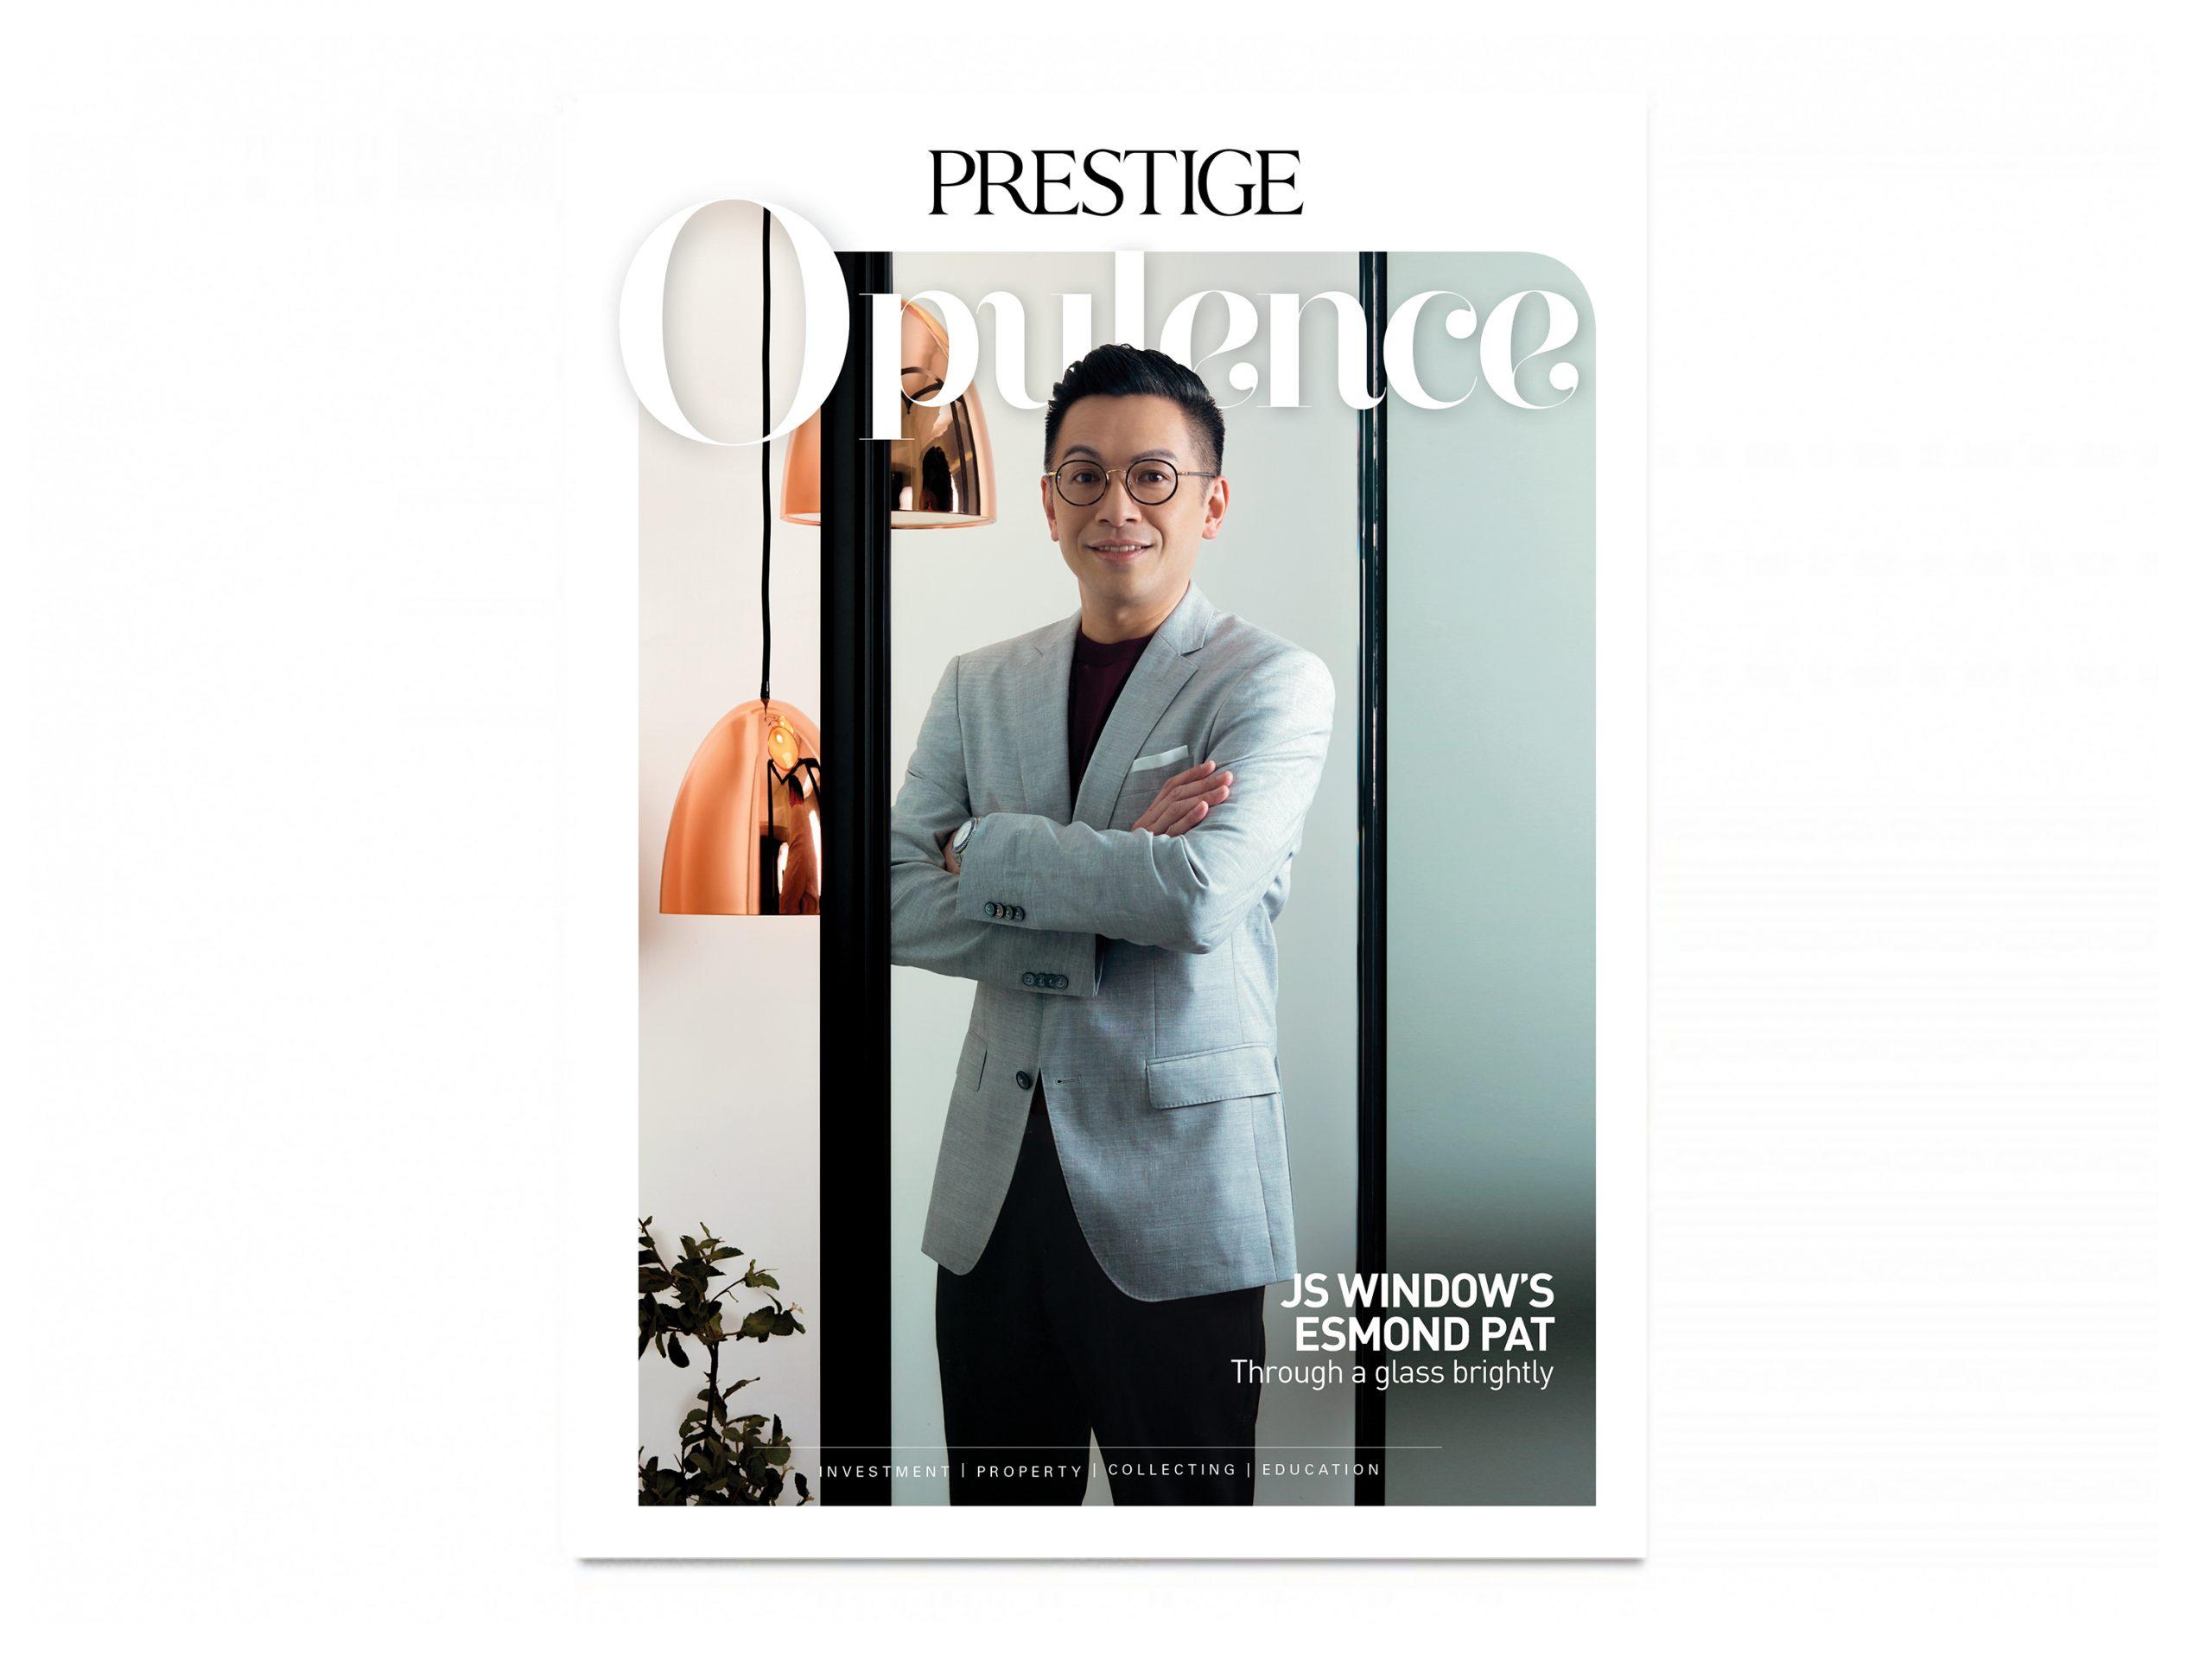 JS Aluminium window Esmond Pat Prestige Opulence Front Cover Interview